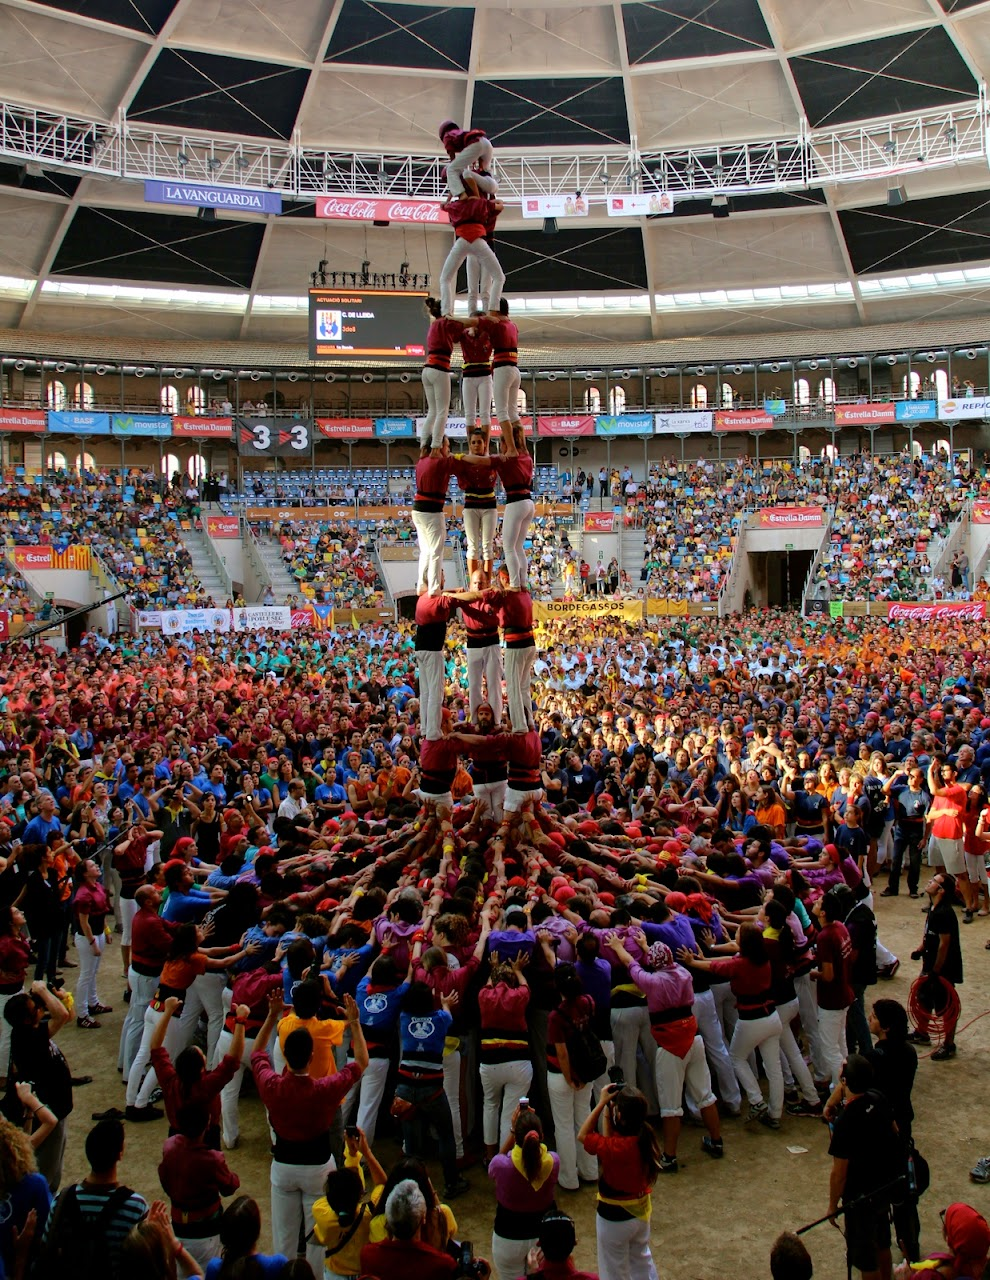 XXV Concurs de Tarragona  4-10-14 - IMG_5540.jpg